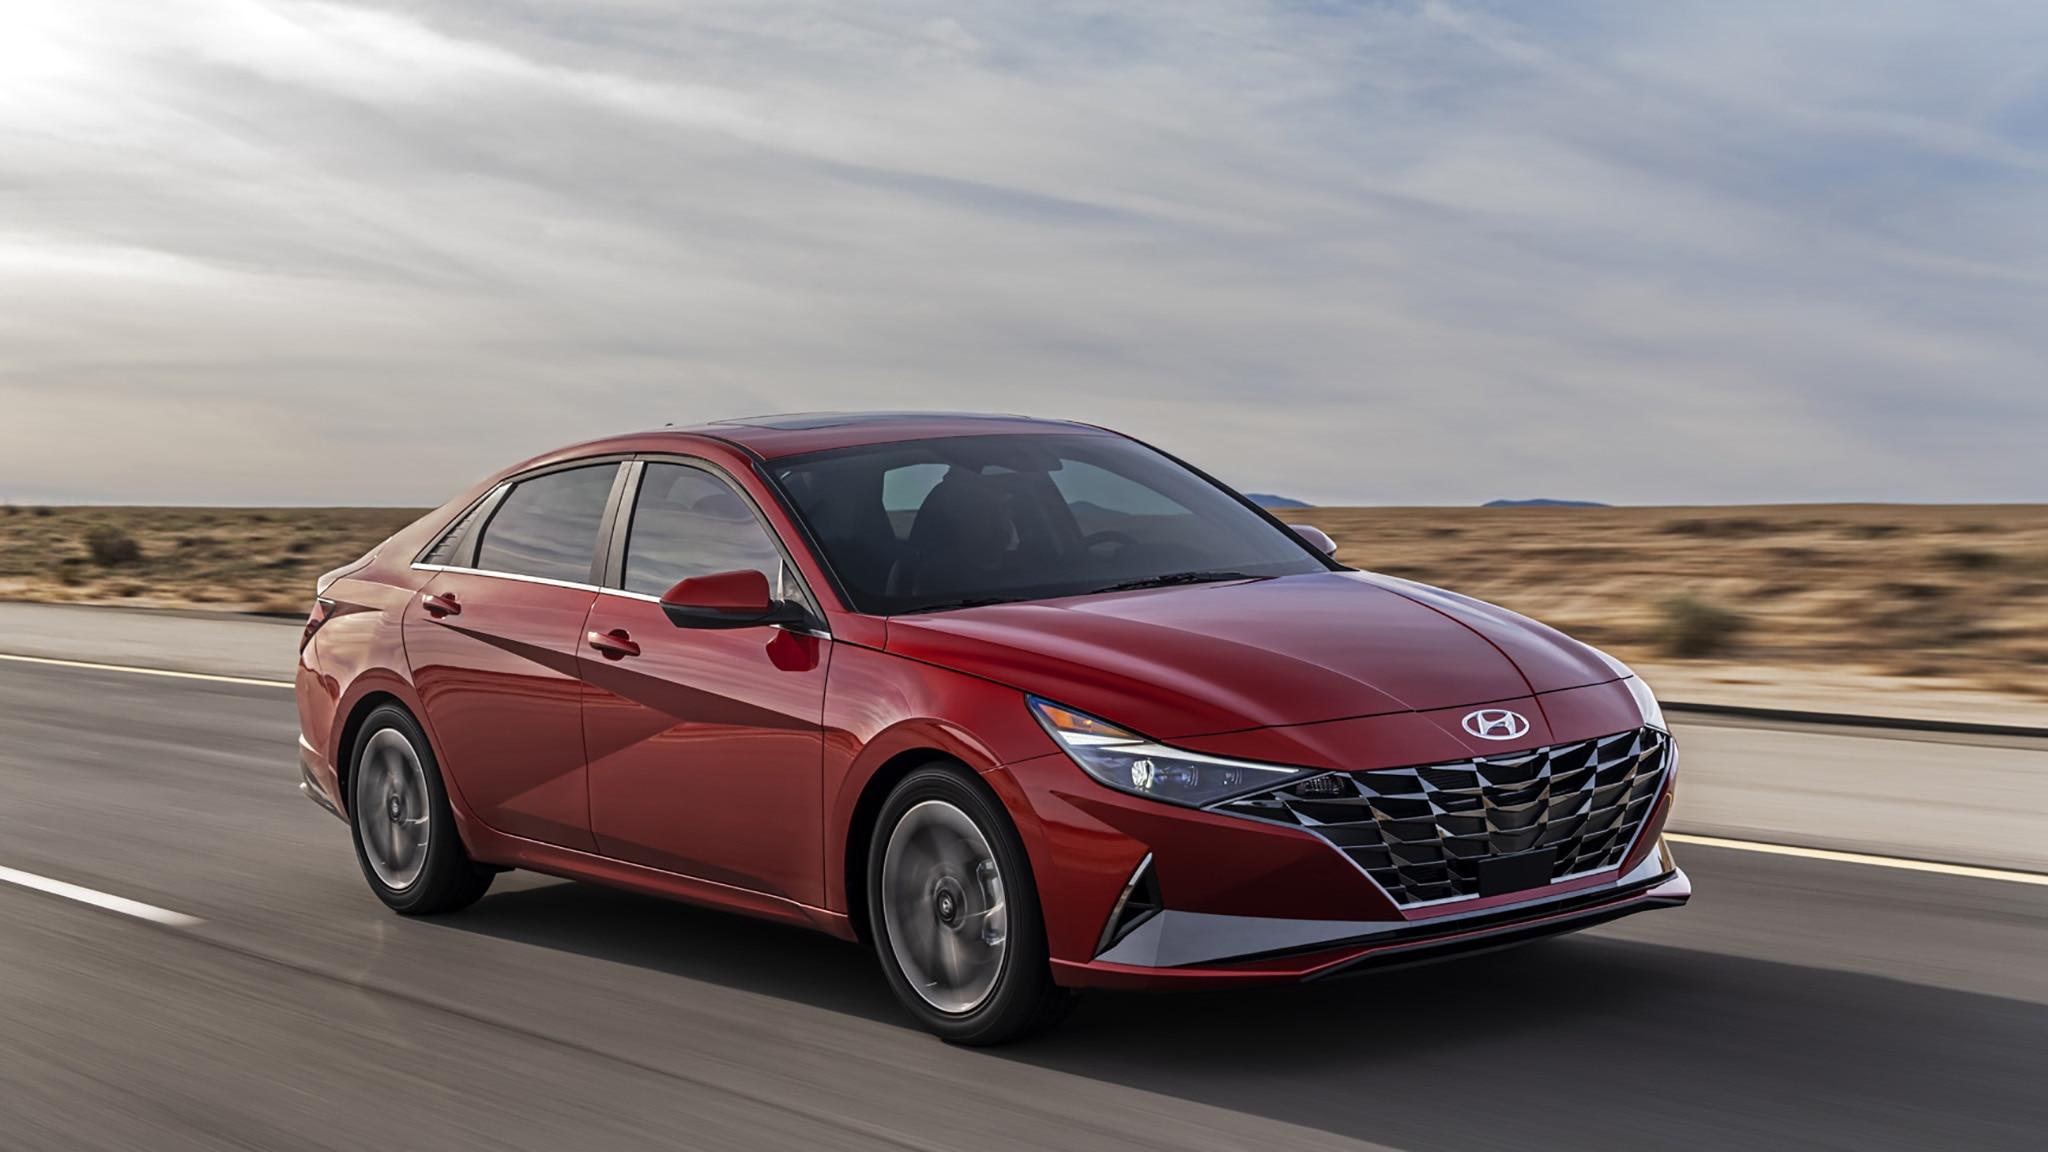 85 2021 Hyundai Elantra